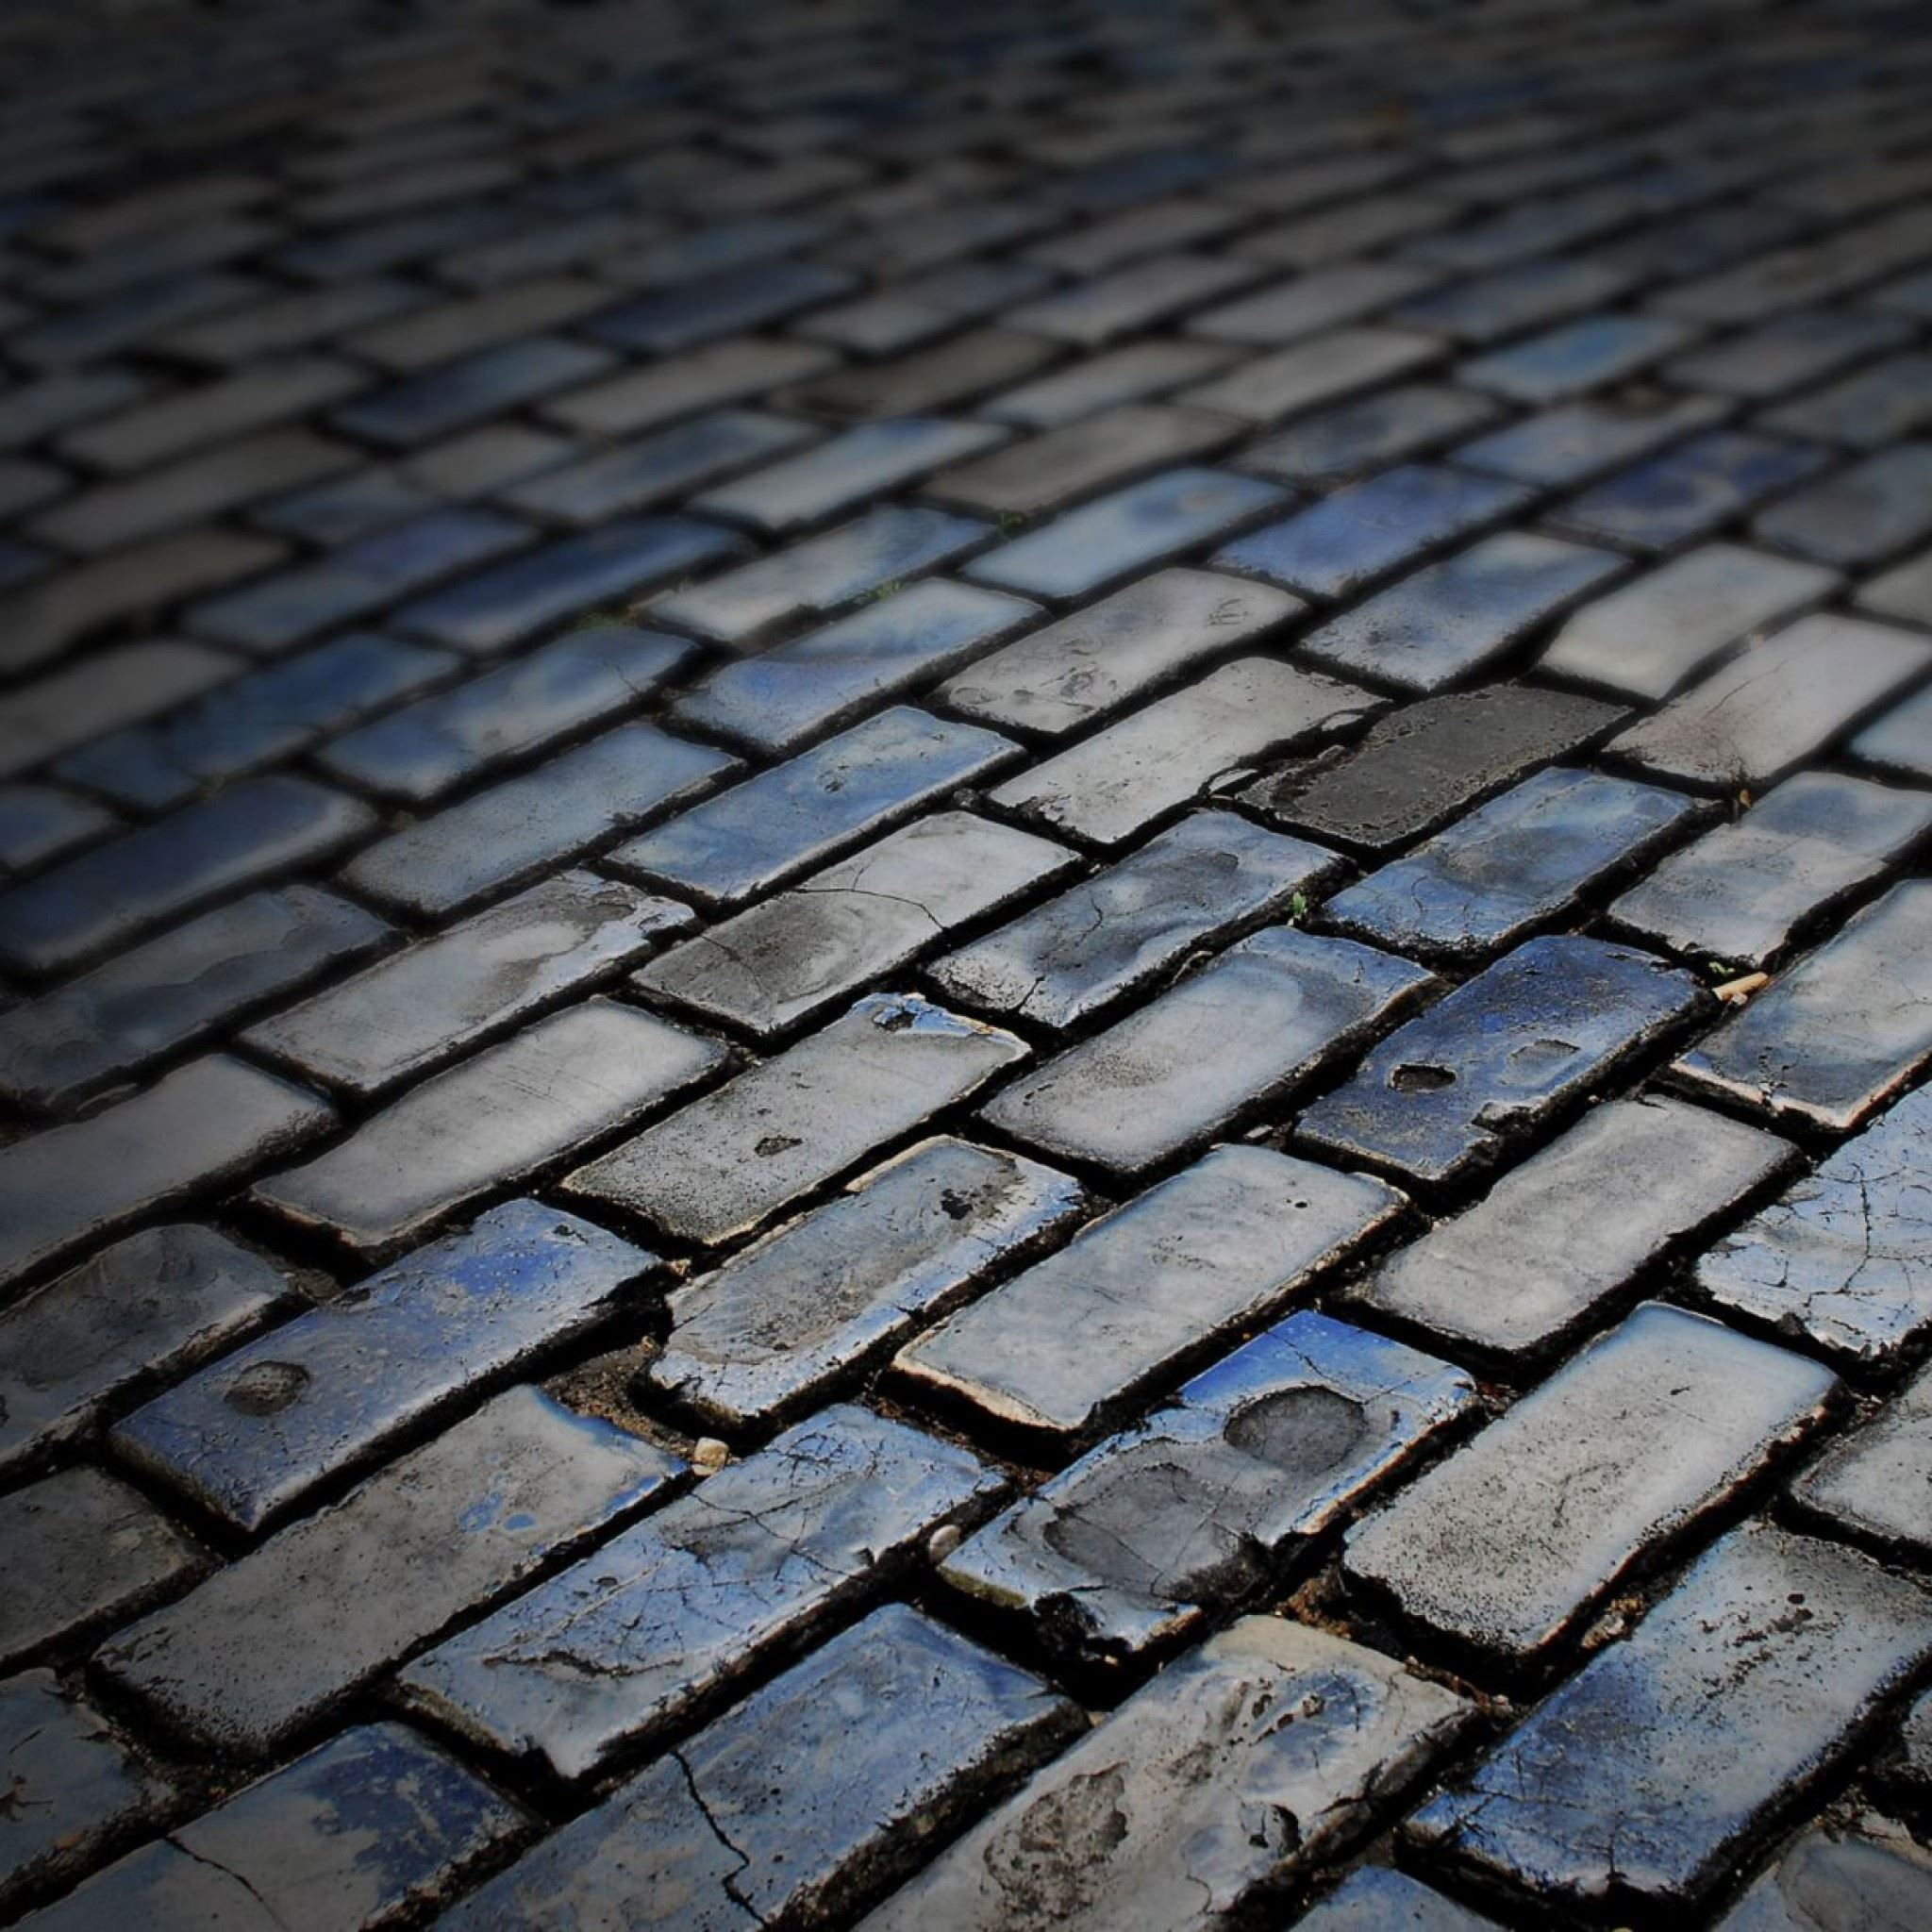 Dark Shades Of Brick Ipad Air Wallpaper Download Iphone Wallpapers